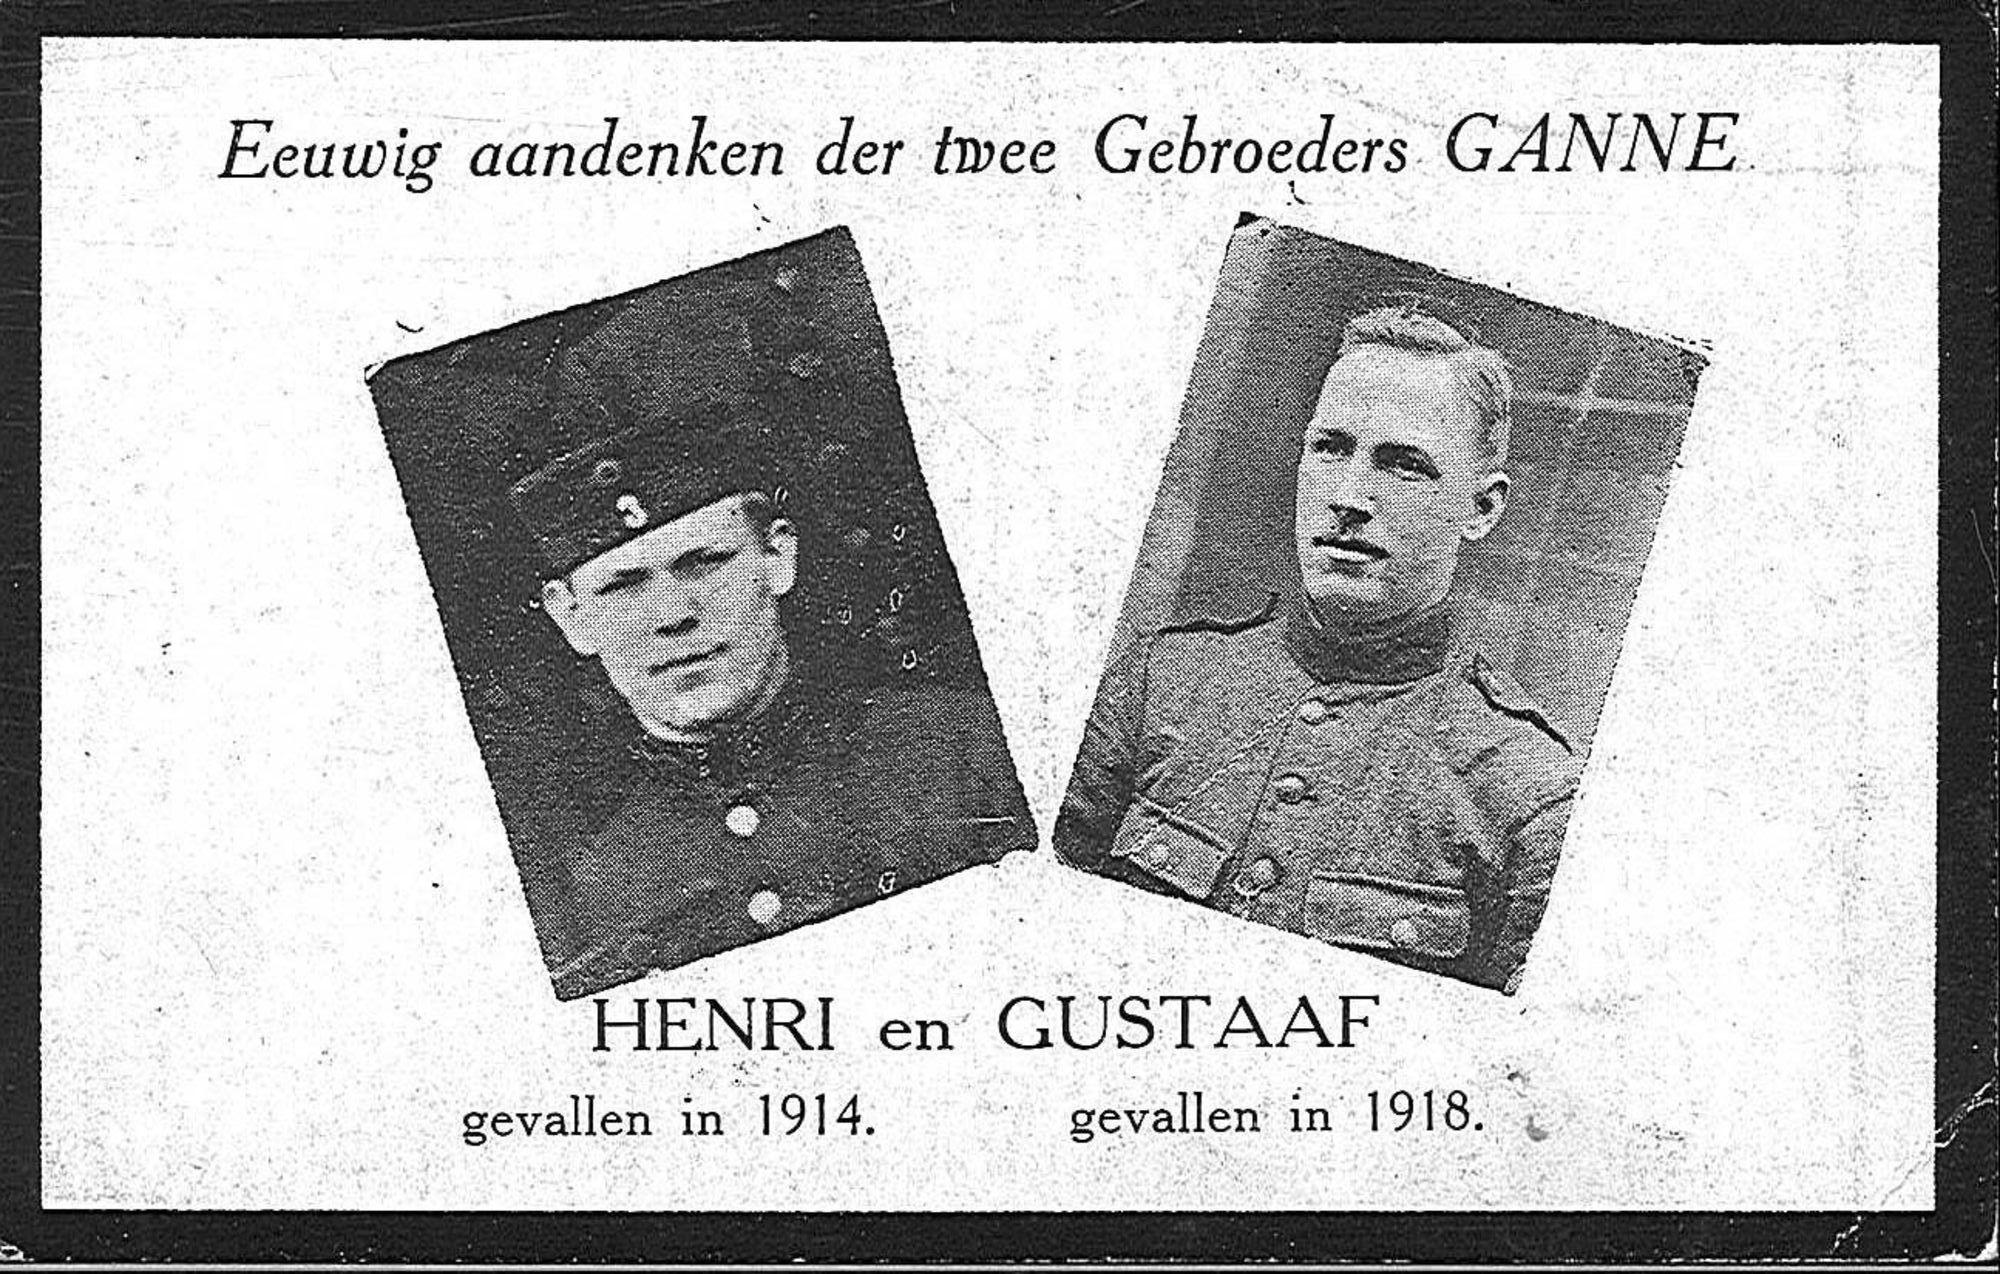 Henri Ganne en Gustaaf Ganne